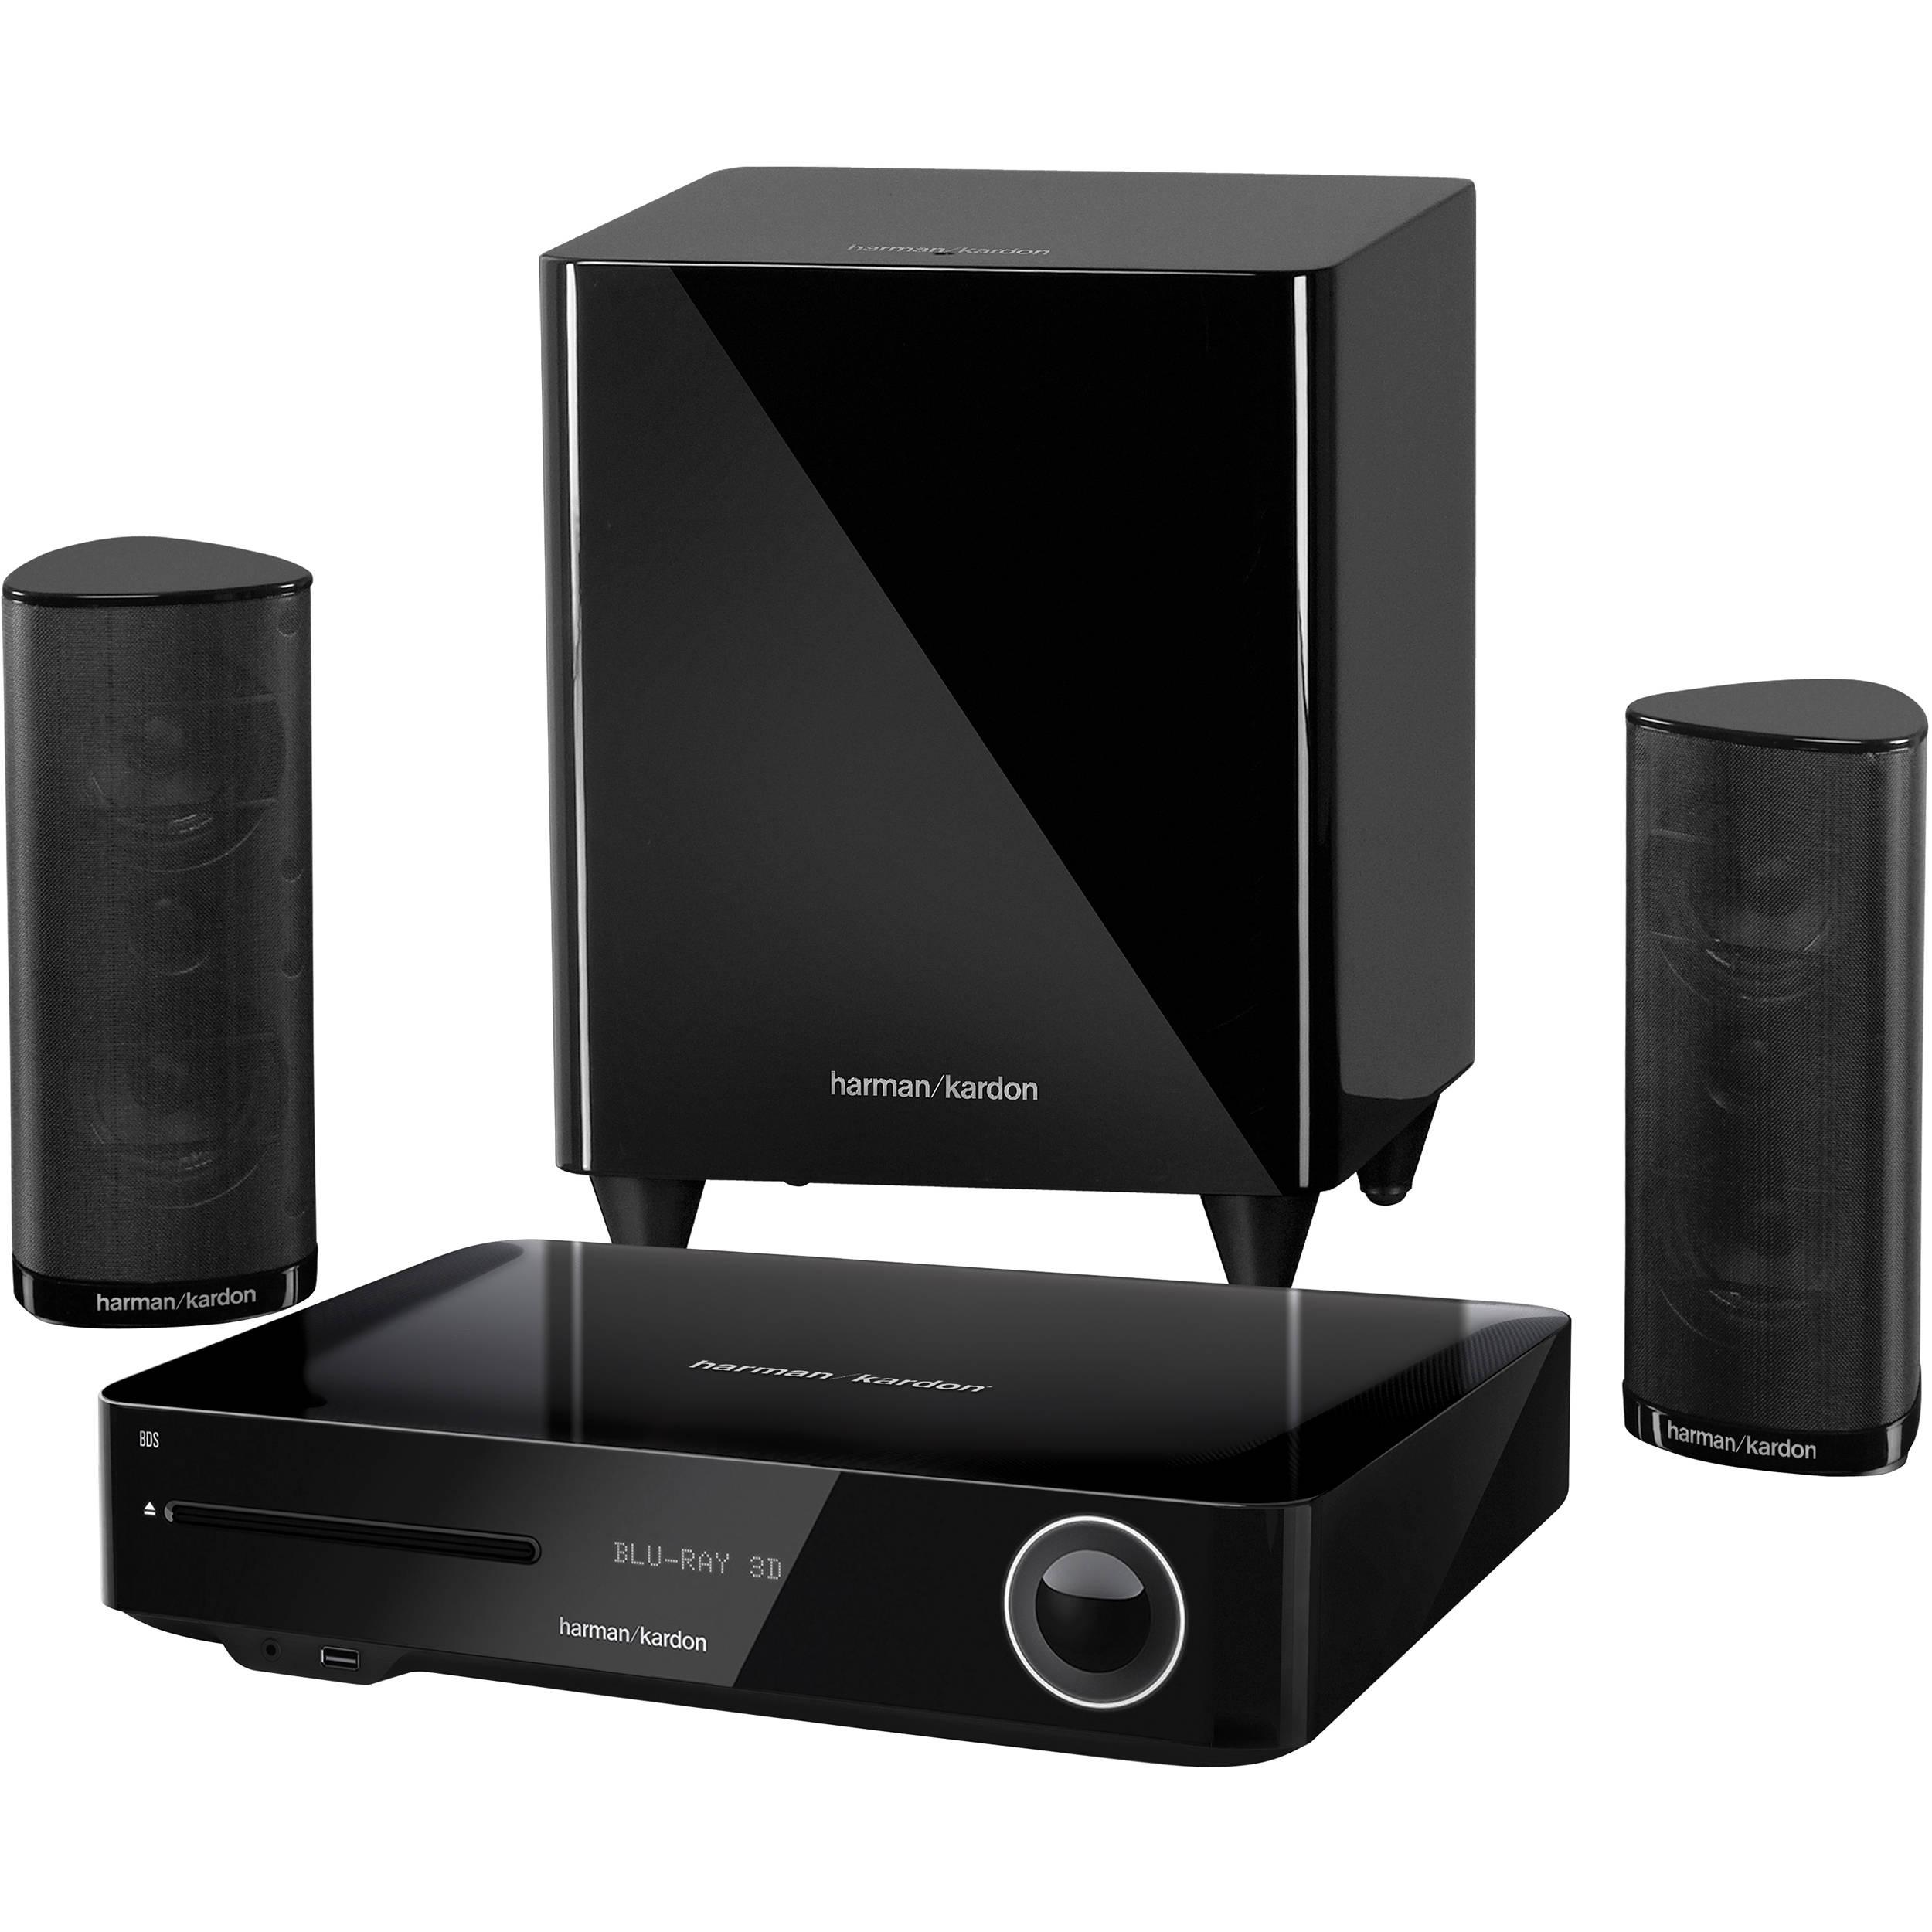 Harman Kardon 280.Harman Kardon Bds 380 High Performance 2 1 Channel Networked 3d Blu Ray Disc System